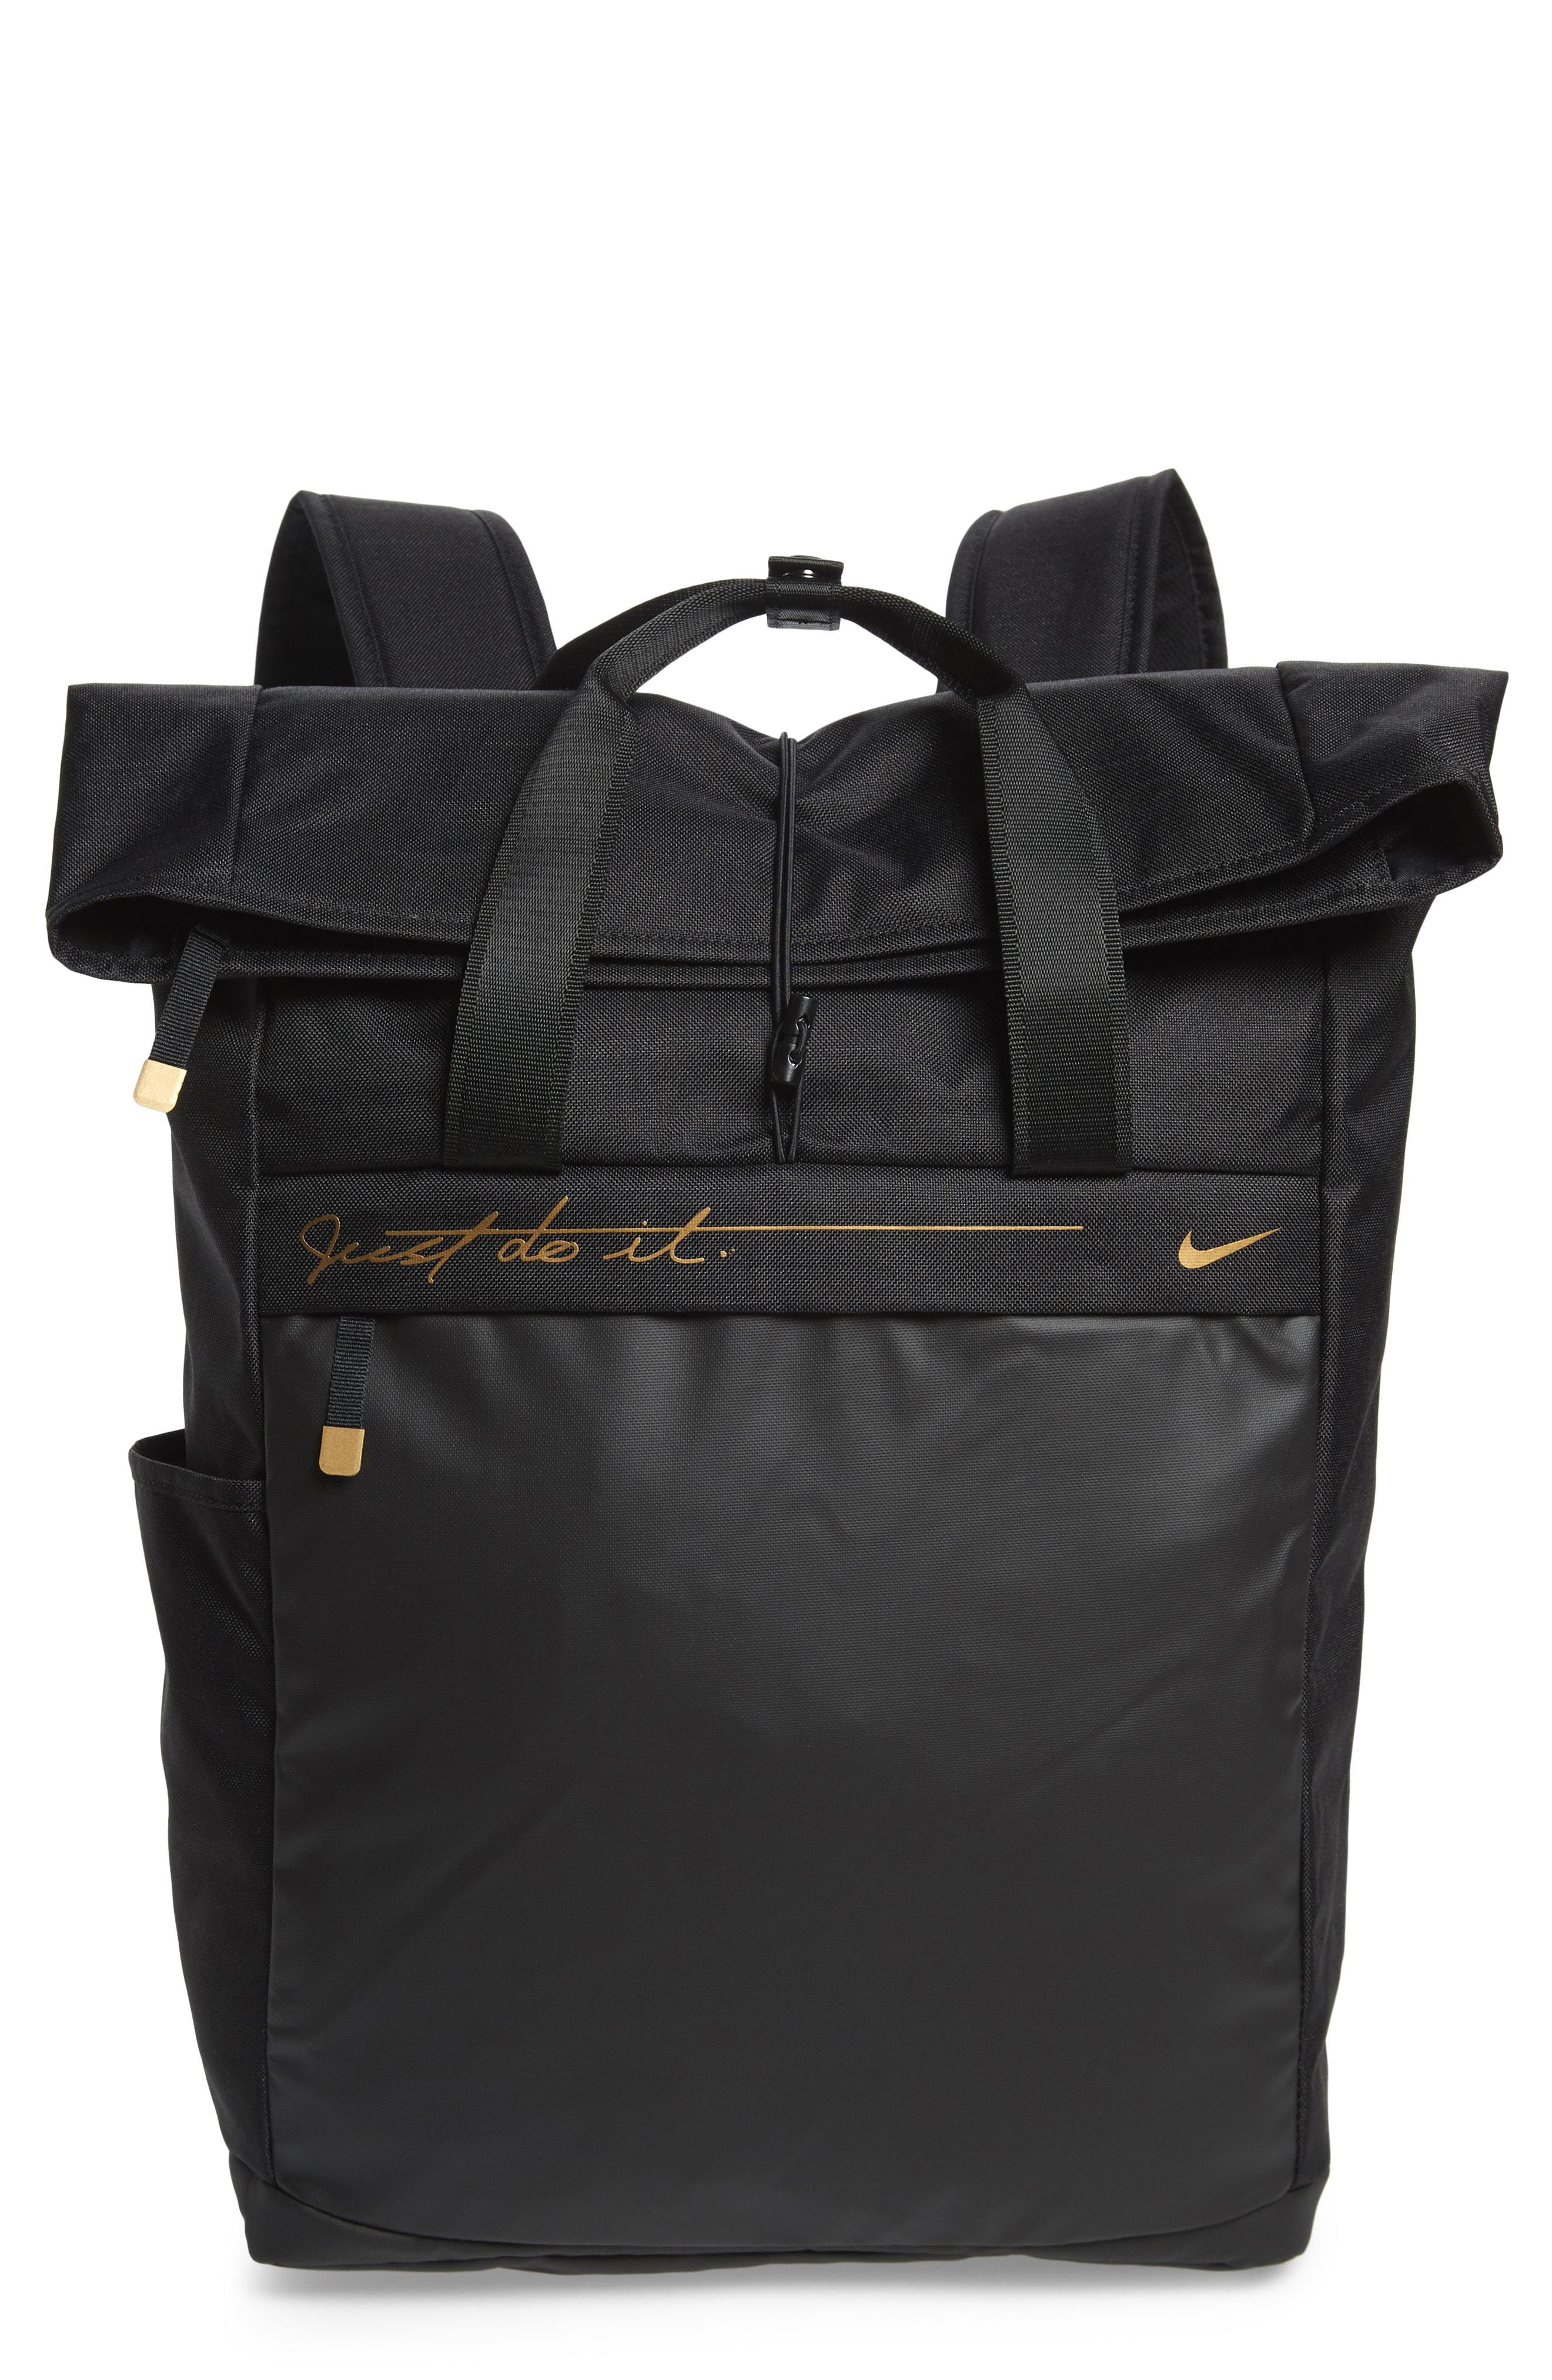 Nike Canvas Radiate Backpack - in Black